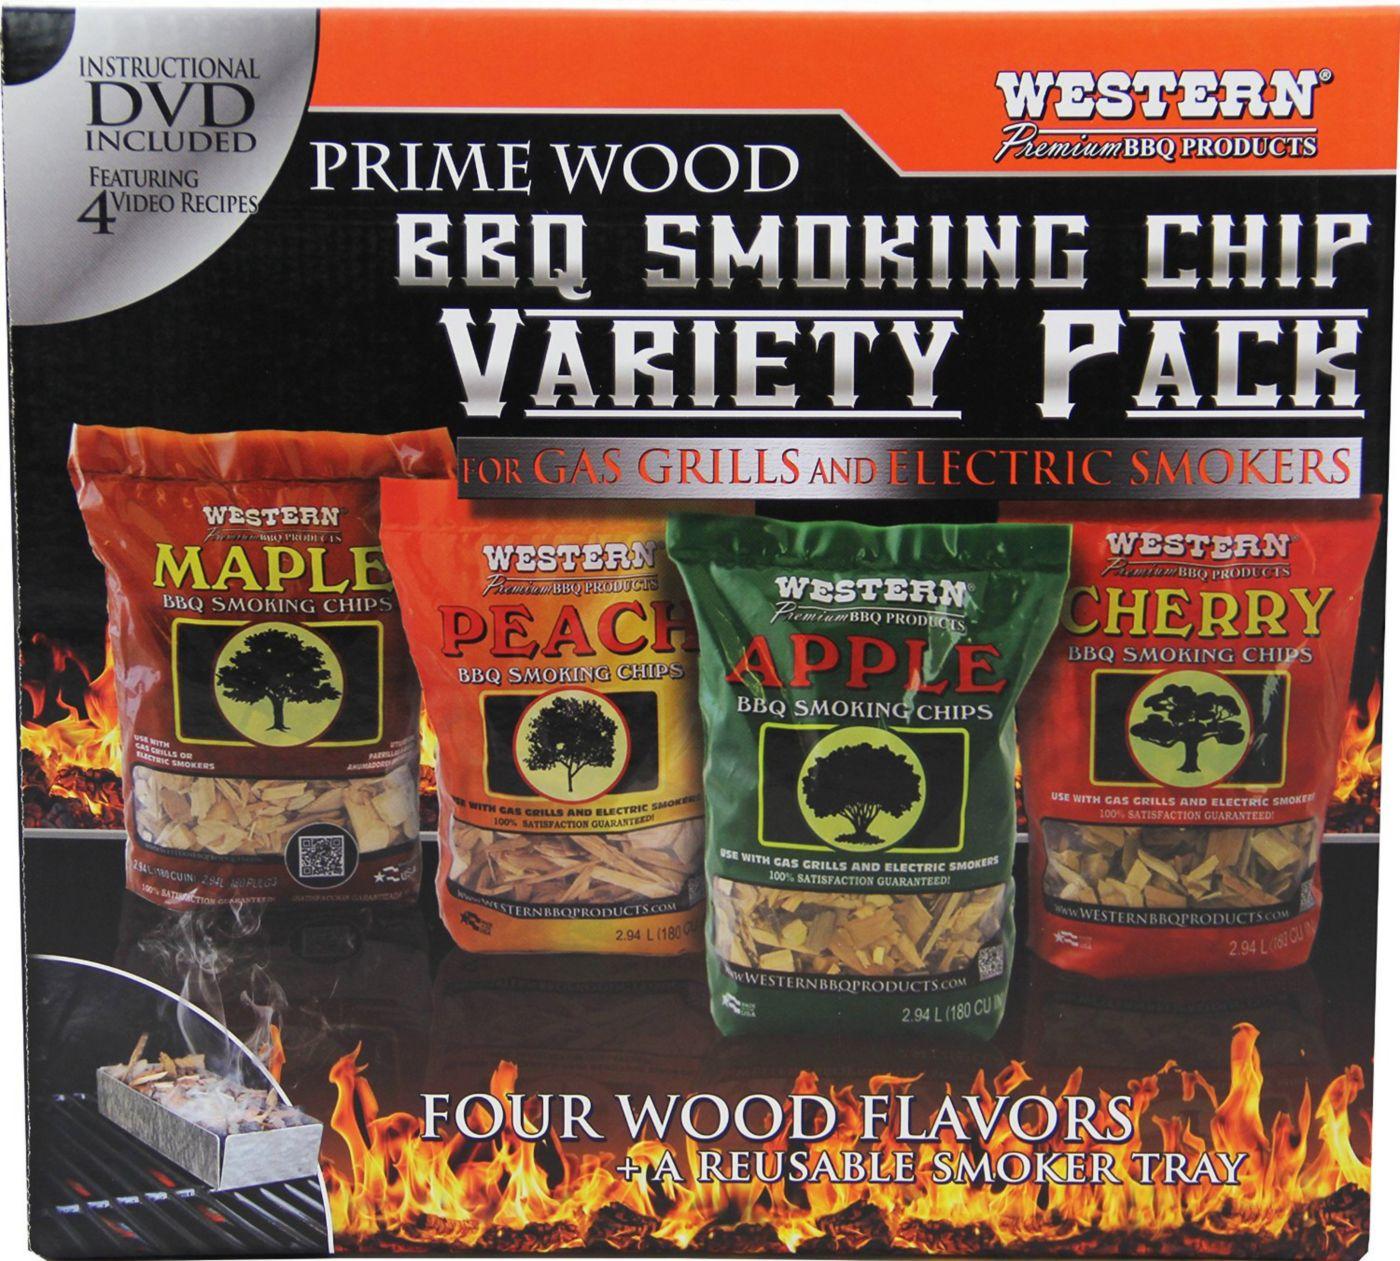 WESTERN Wood Chip Variety Pack